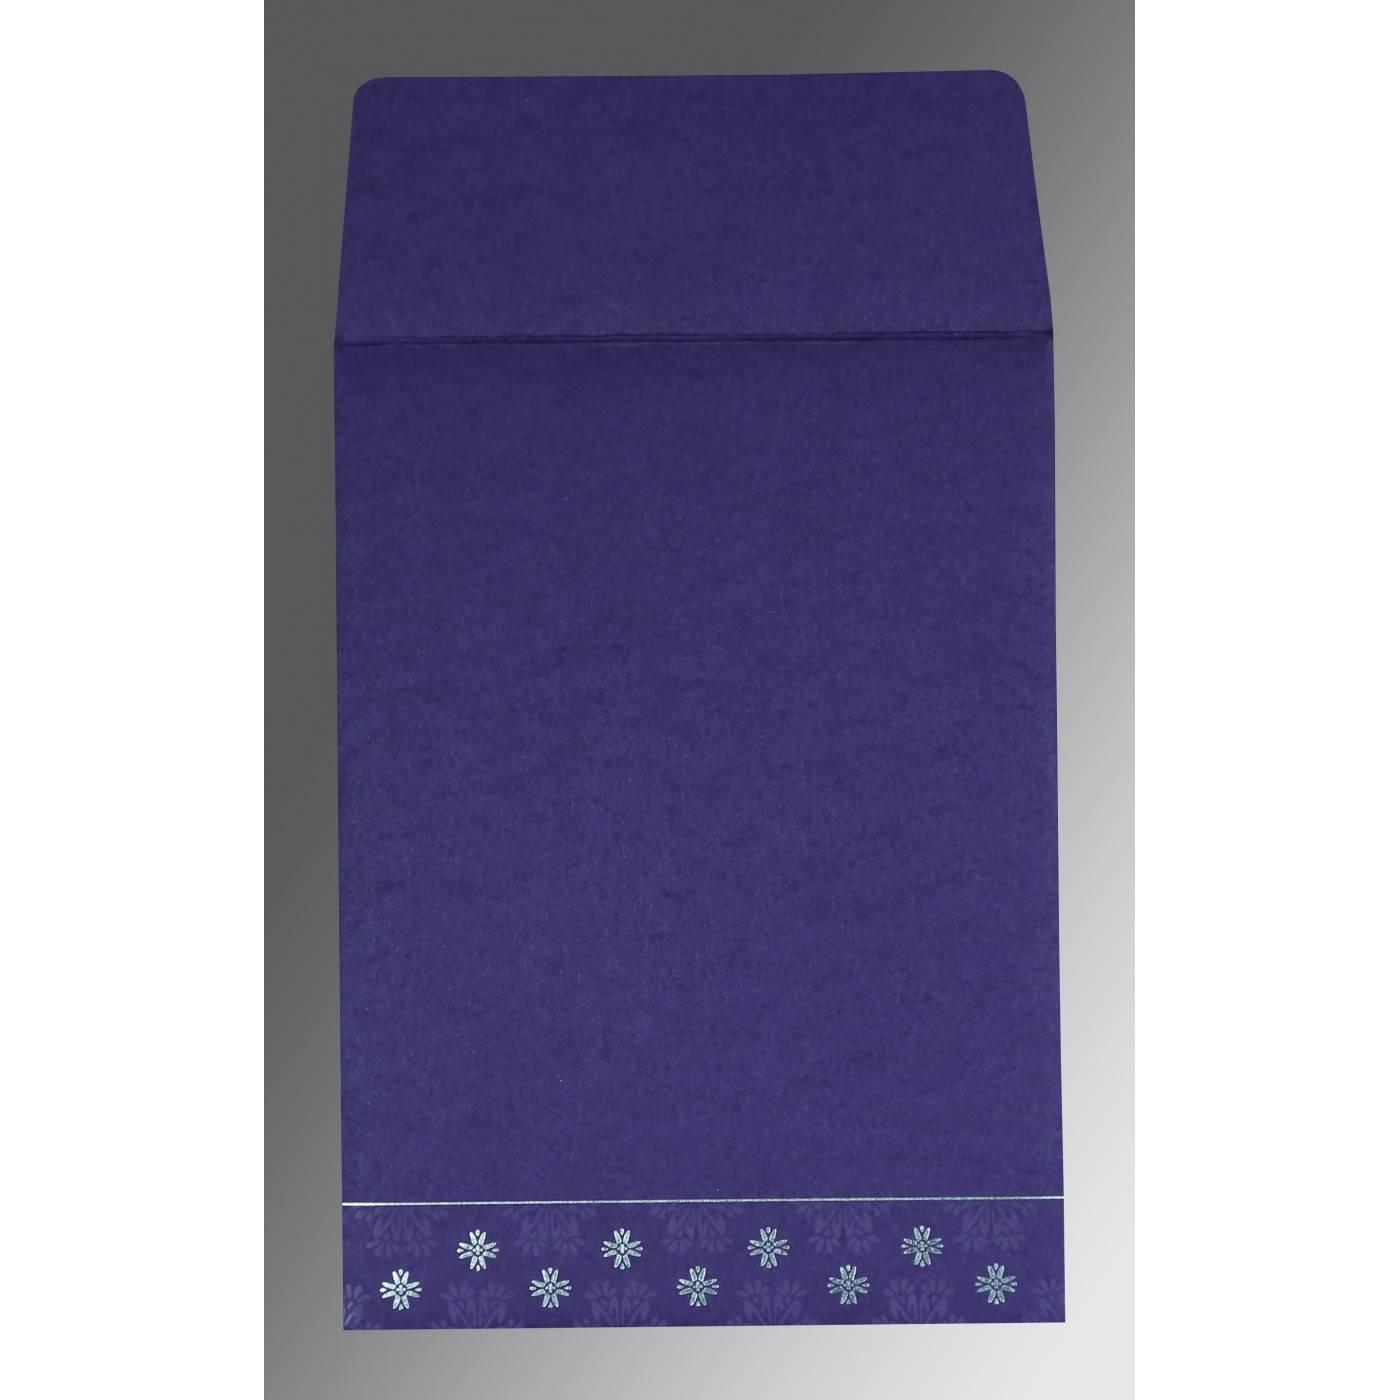 PURPLE MATTE FLORAL THEMED - FOIL STAMPED WEDDING INVITATION : CRU-8237A - IndianWeddingCards